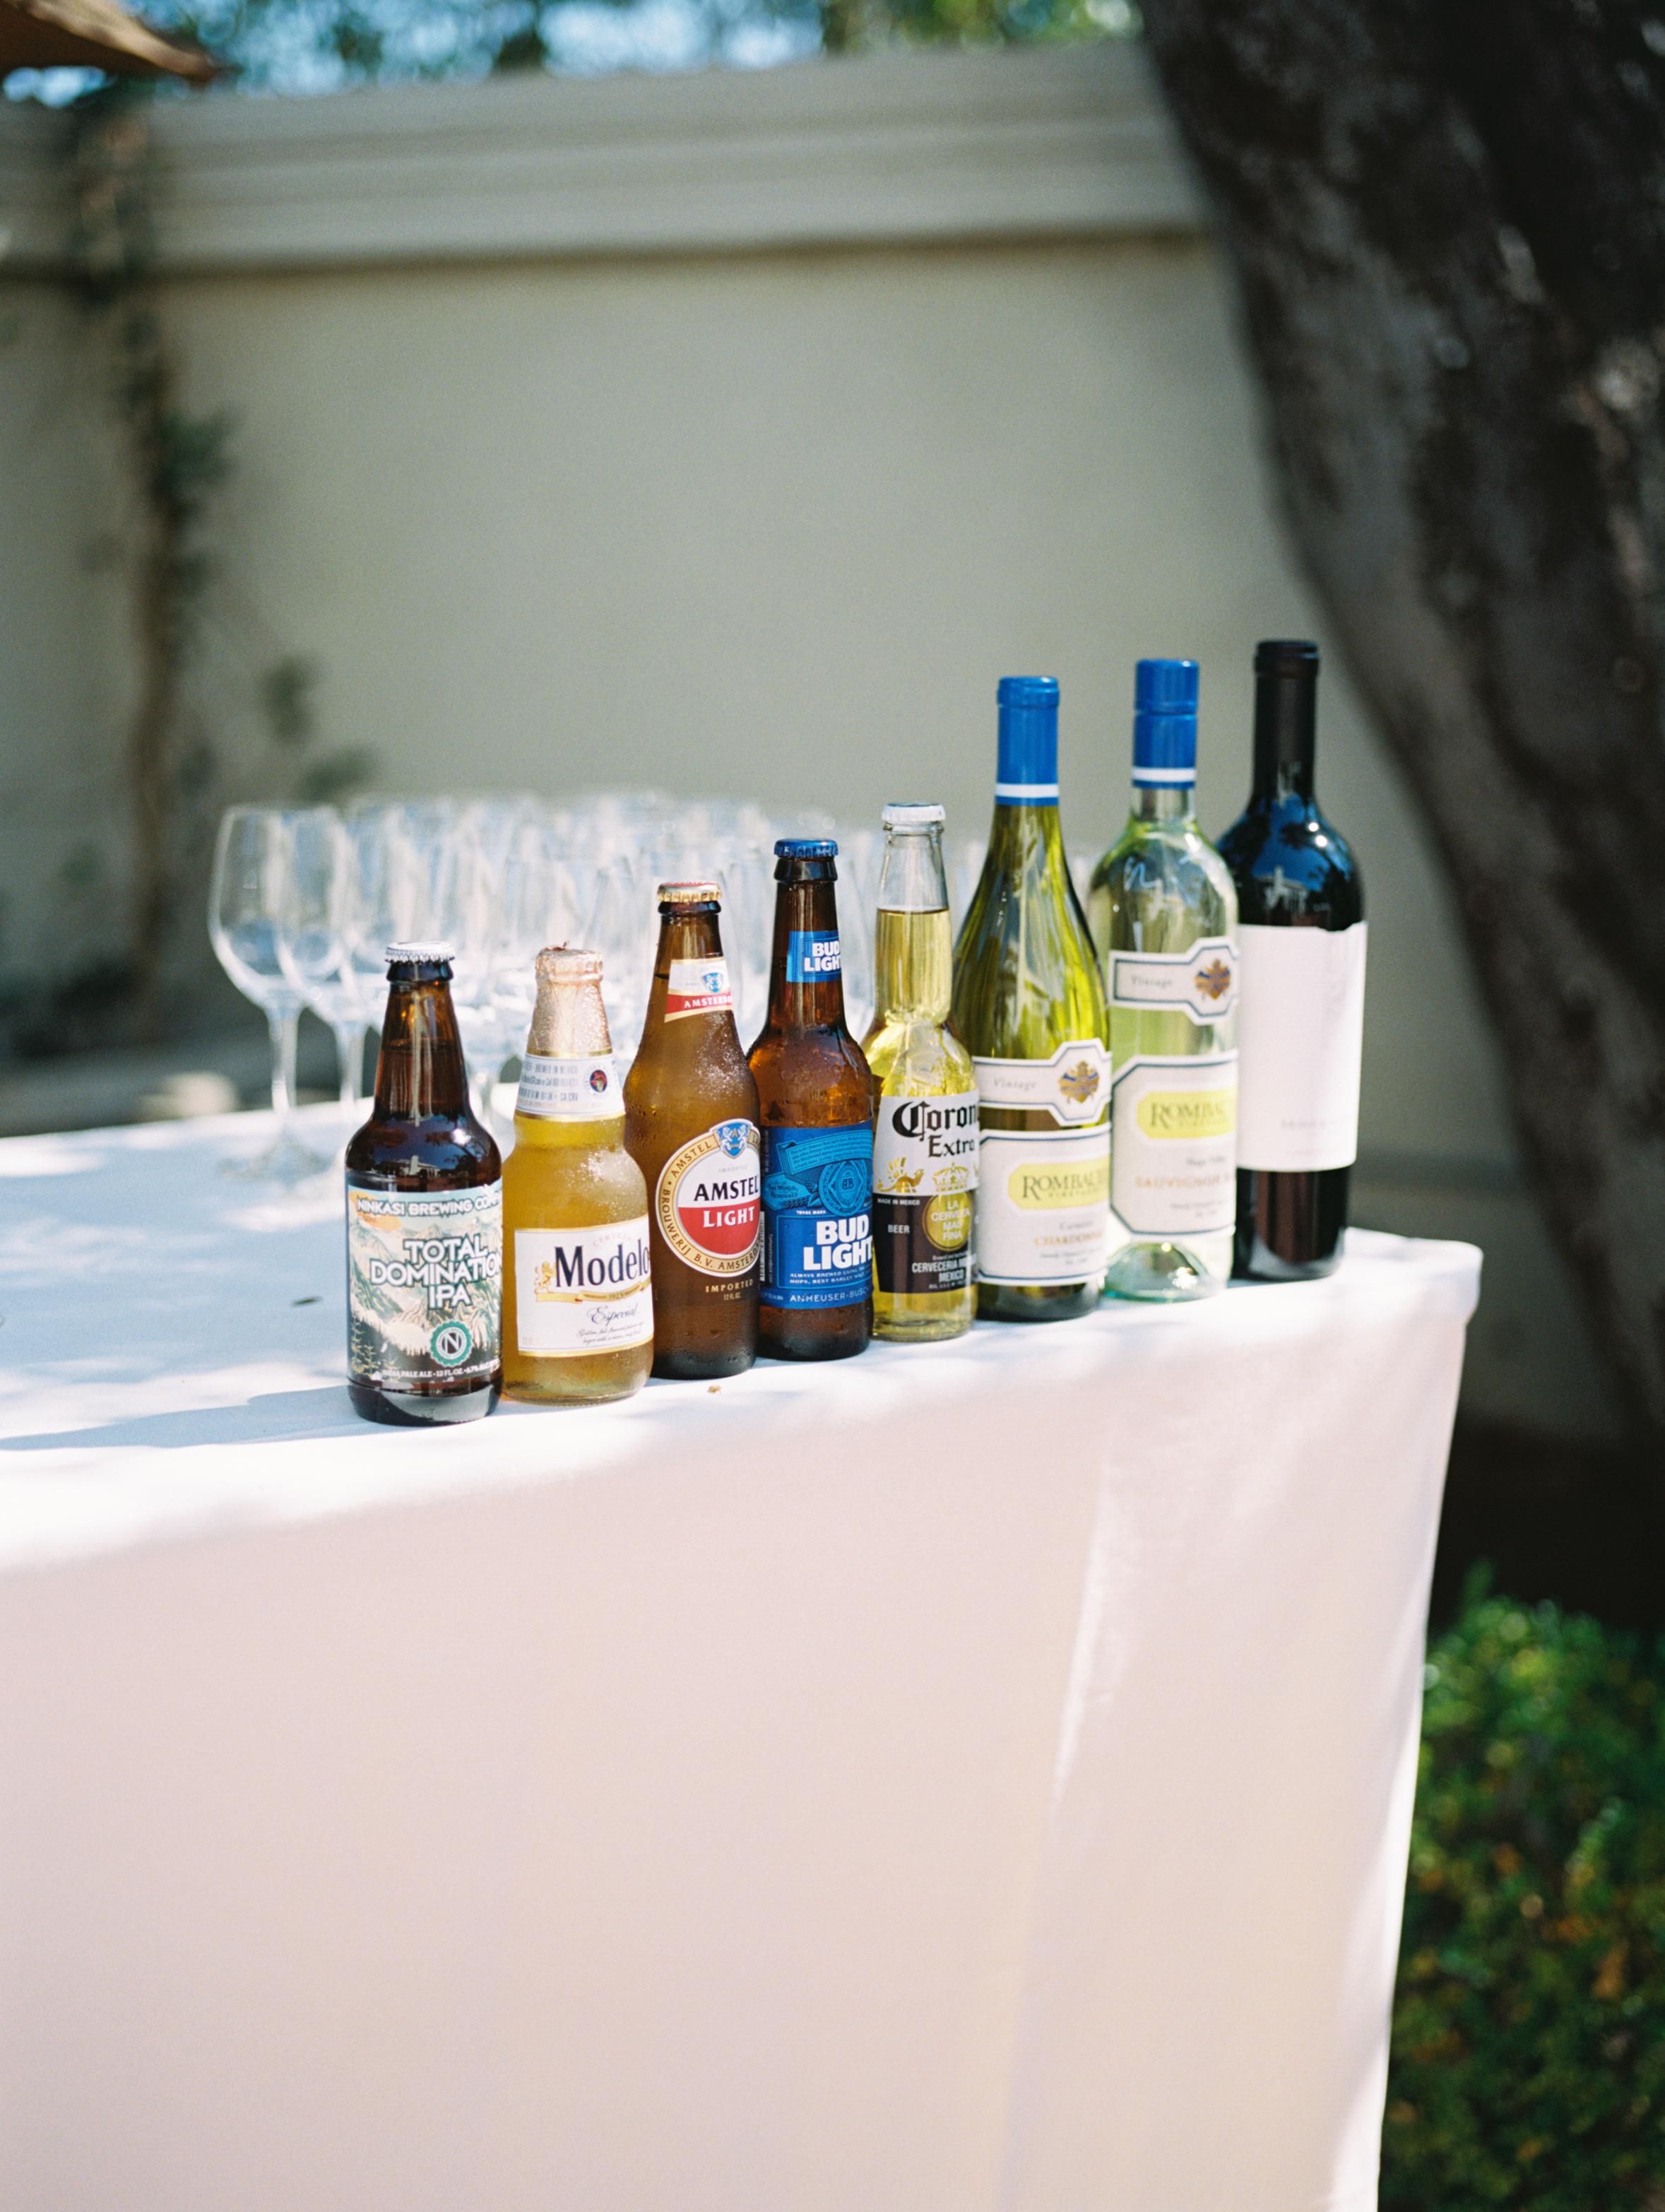 www.santabarbarawedding.com | Ryanne Bee Photography | The Santa Barbara Club | Refreshments for Guests